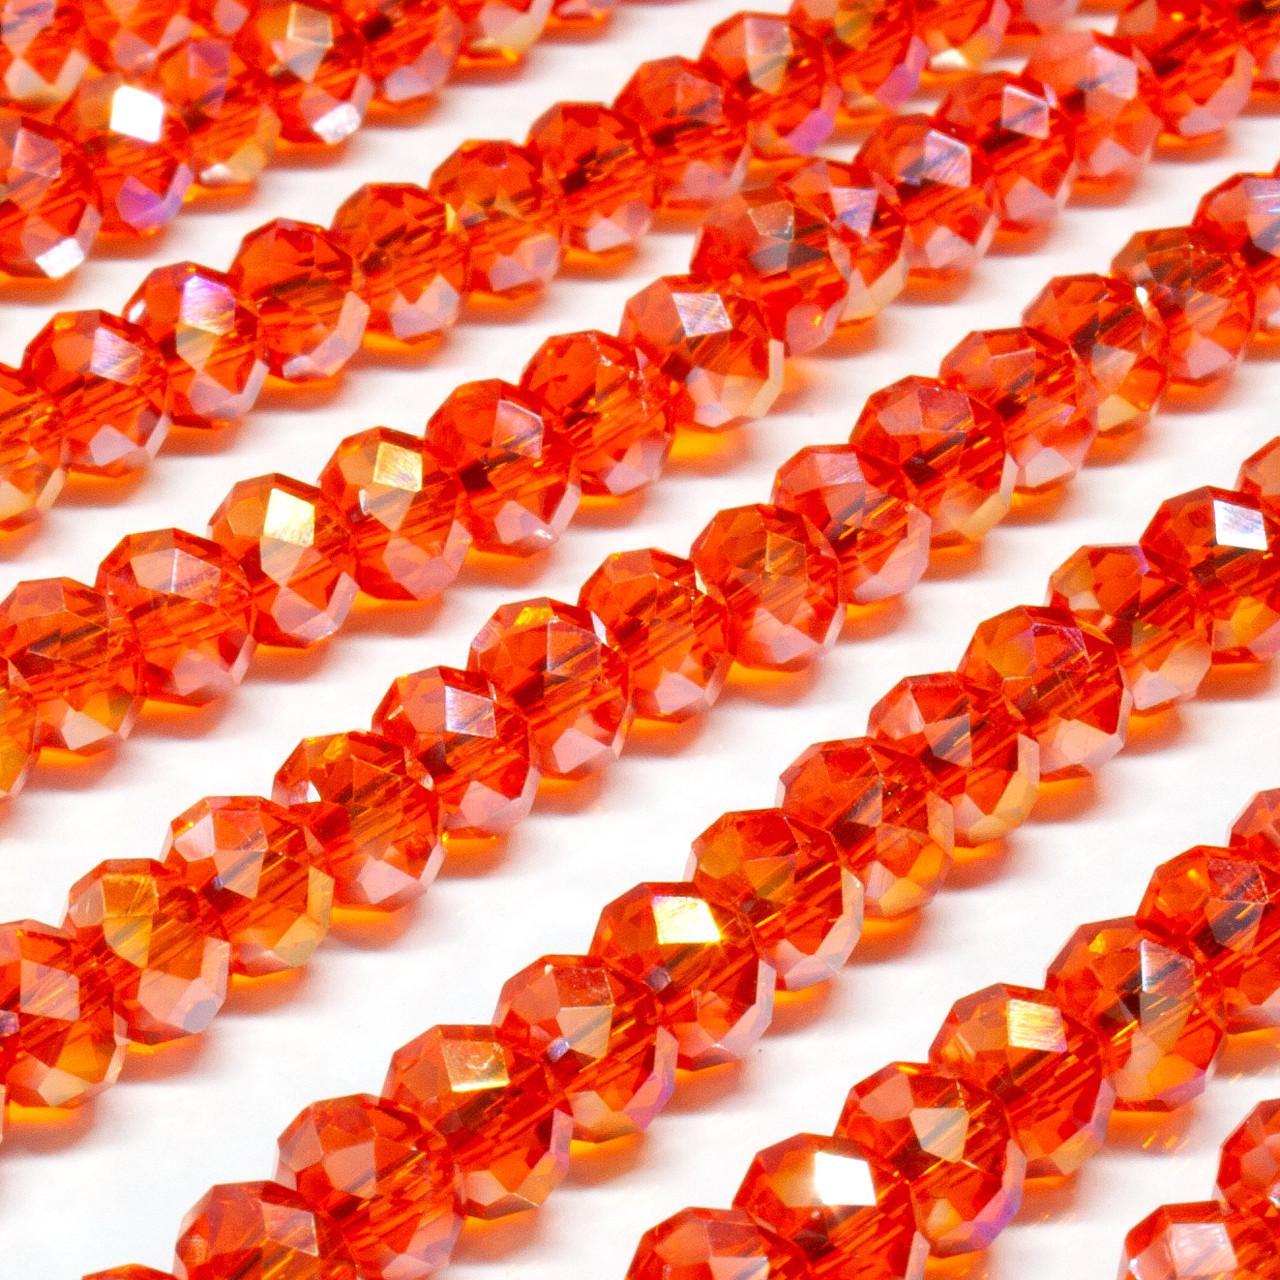 Бусины хрустальные (Рондель)  6х4мм пачка - 95-105 шт, цвет - оранж прозрачный с АБ